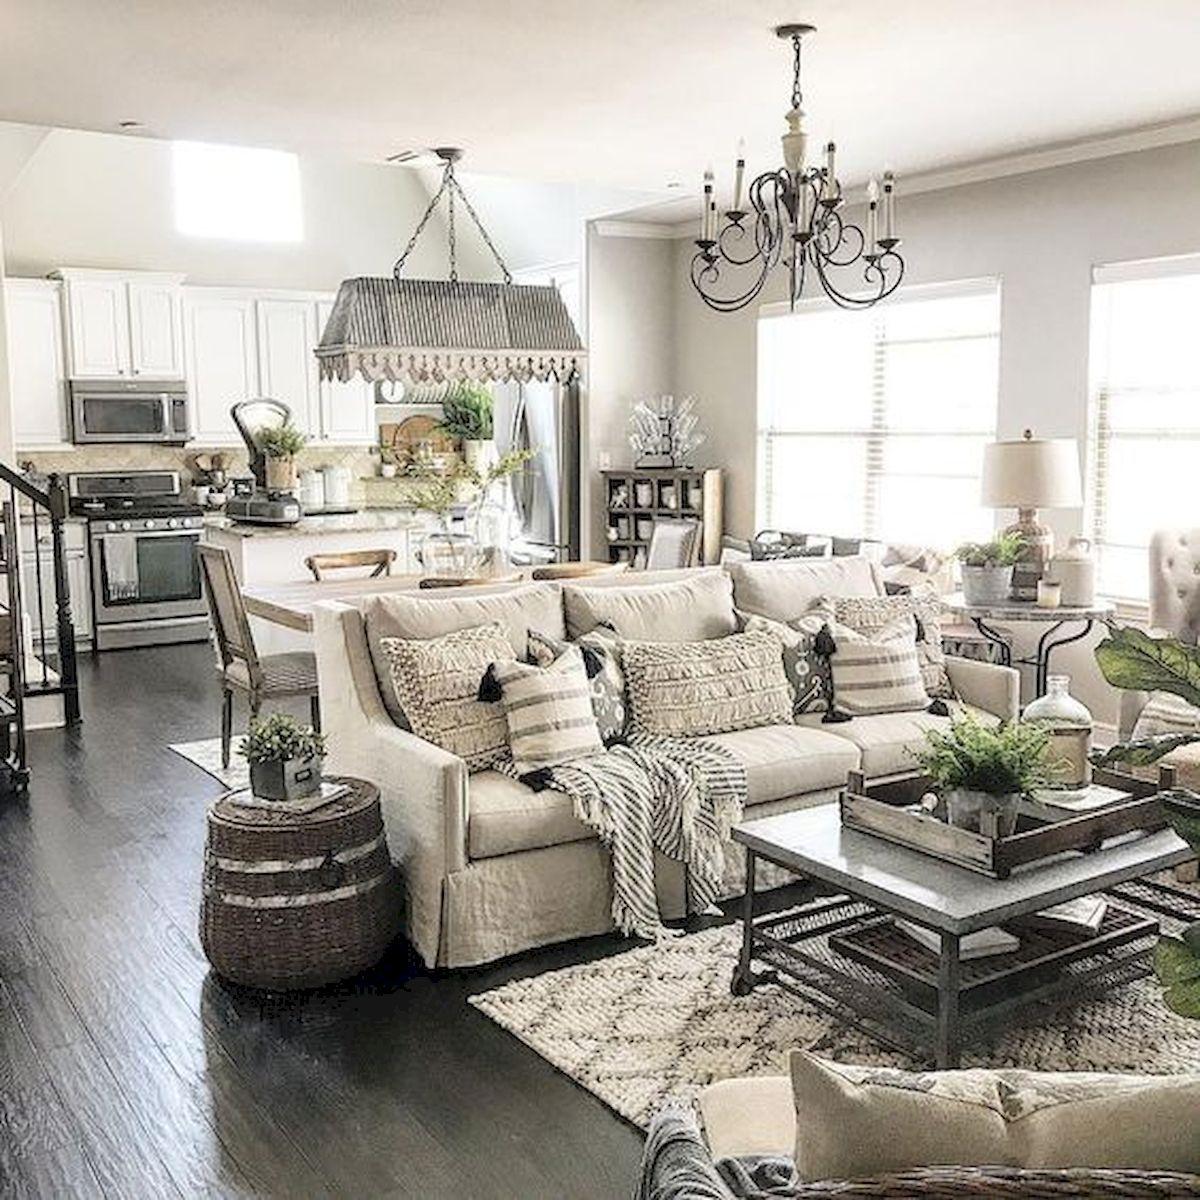 Adorable incredible farmhouse living room sofa design ideas and decor source https also excellent modern interior ideas in rh pinterest